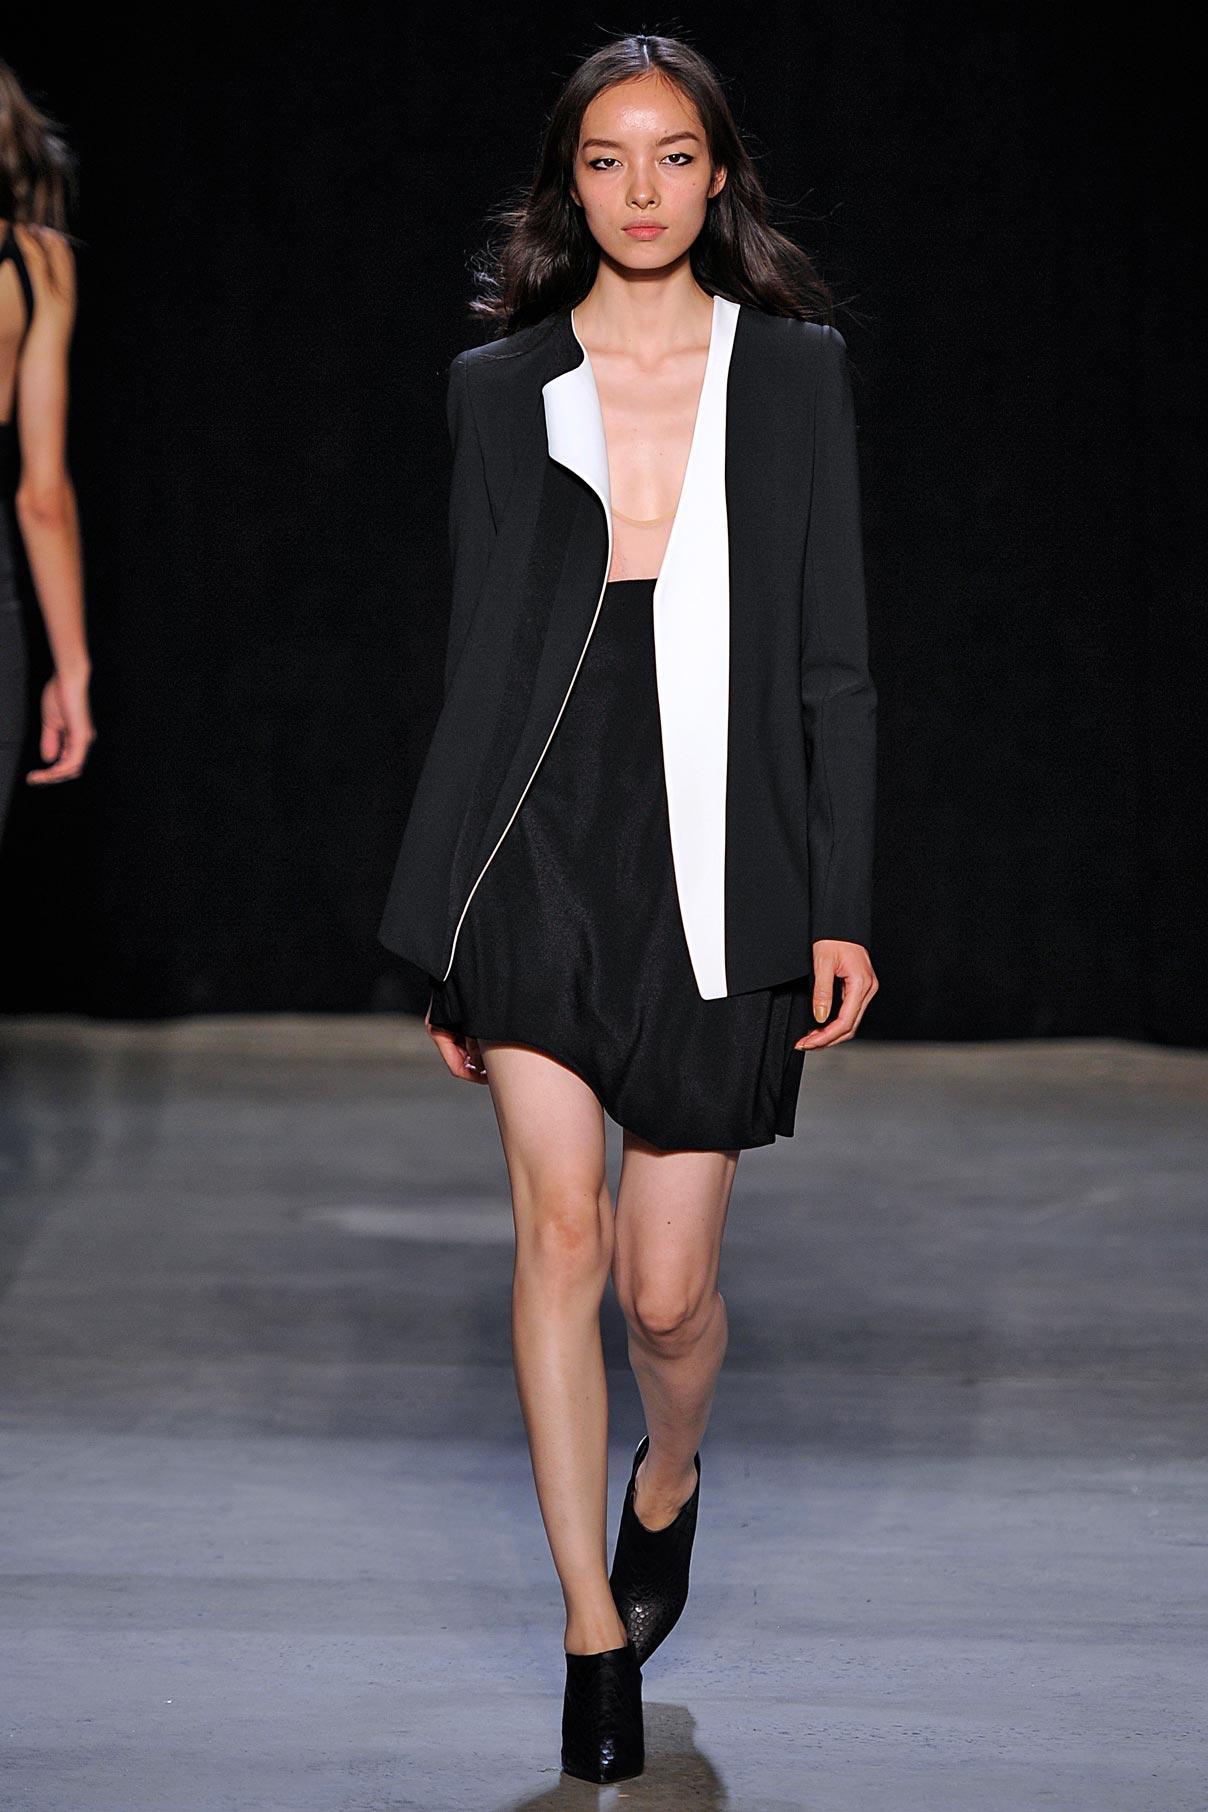 Look 15 Black/white crepe jacket with blush/black kimono silk dress.